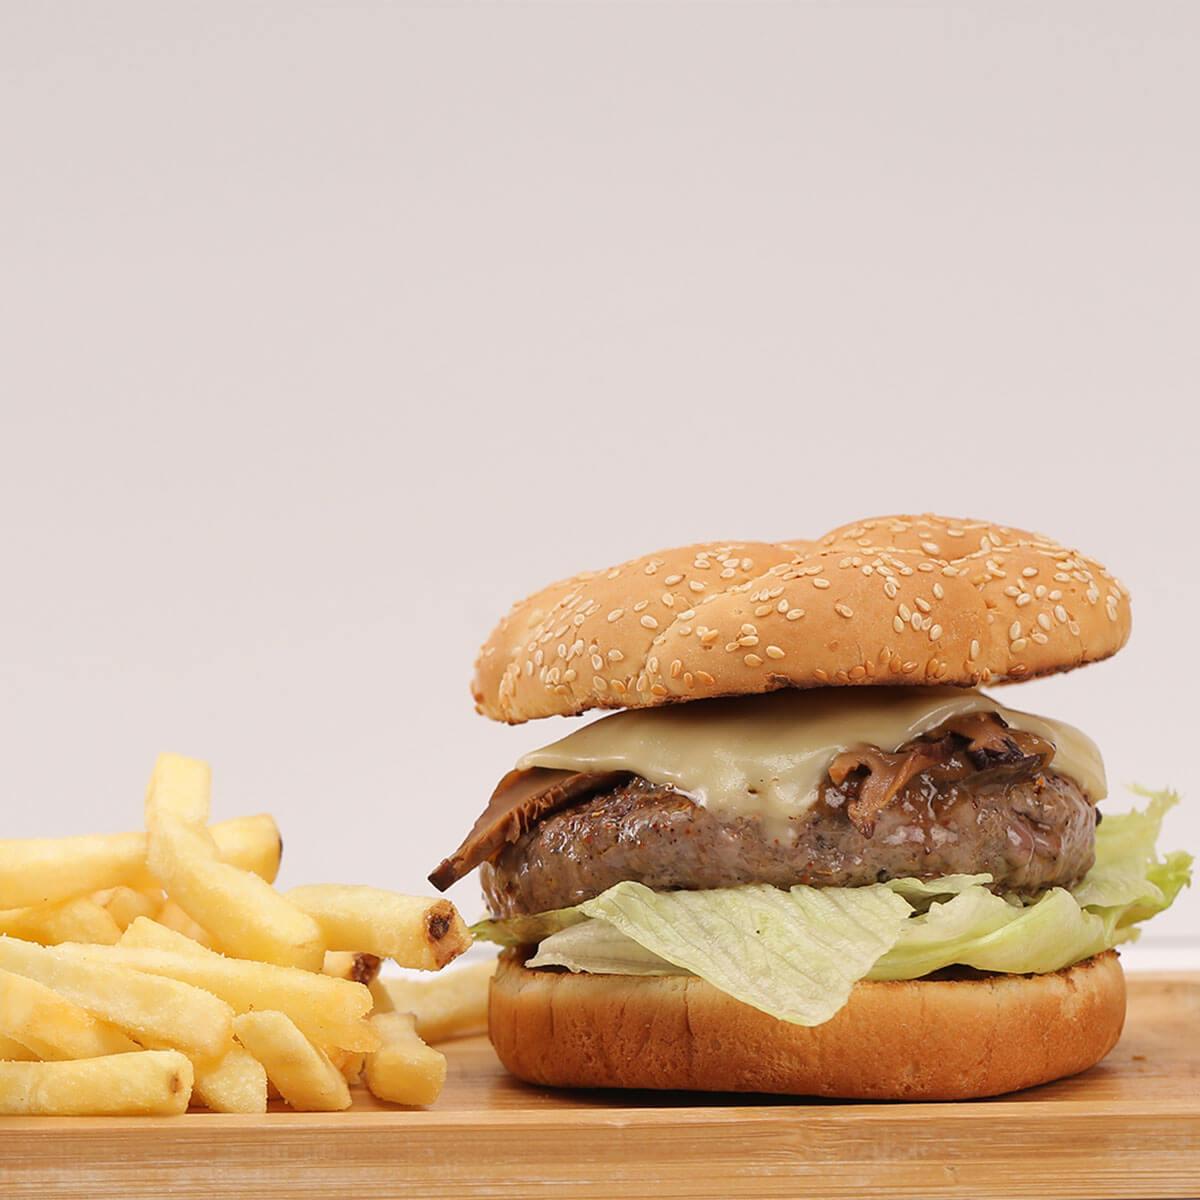 Best Fast food Restaurant | Room Service